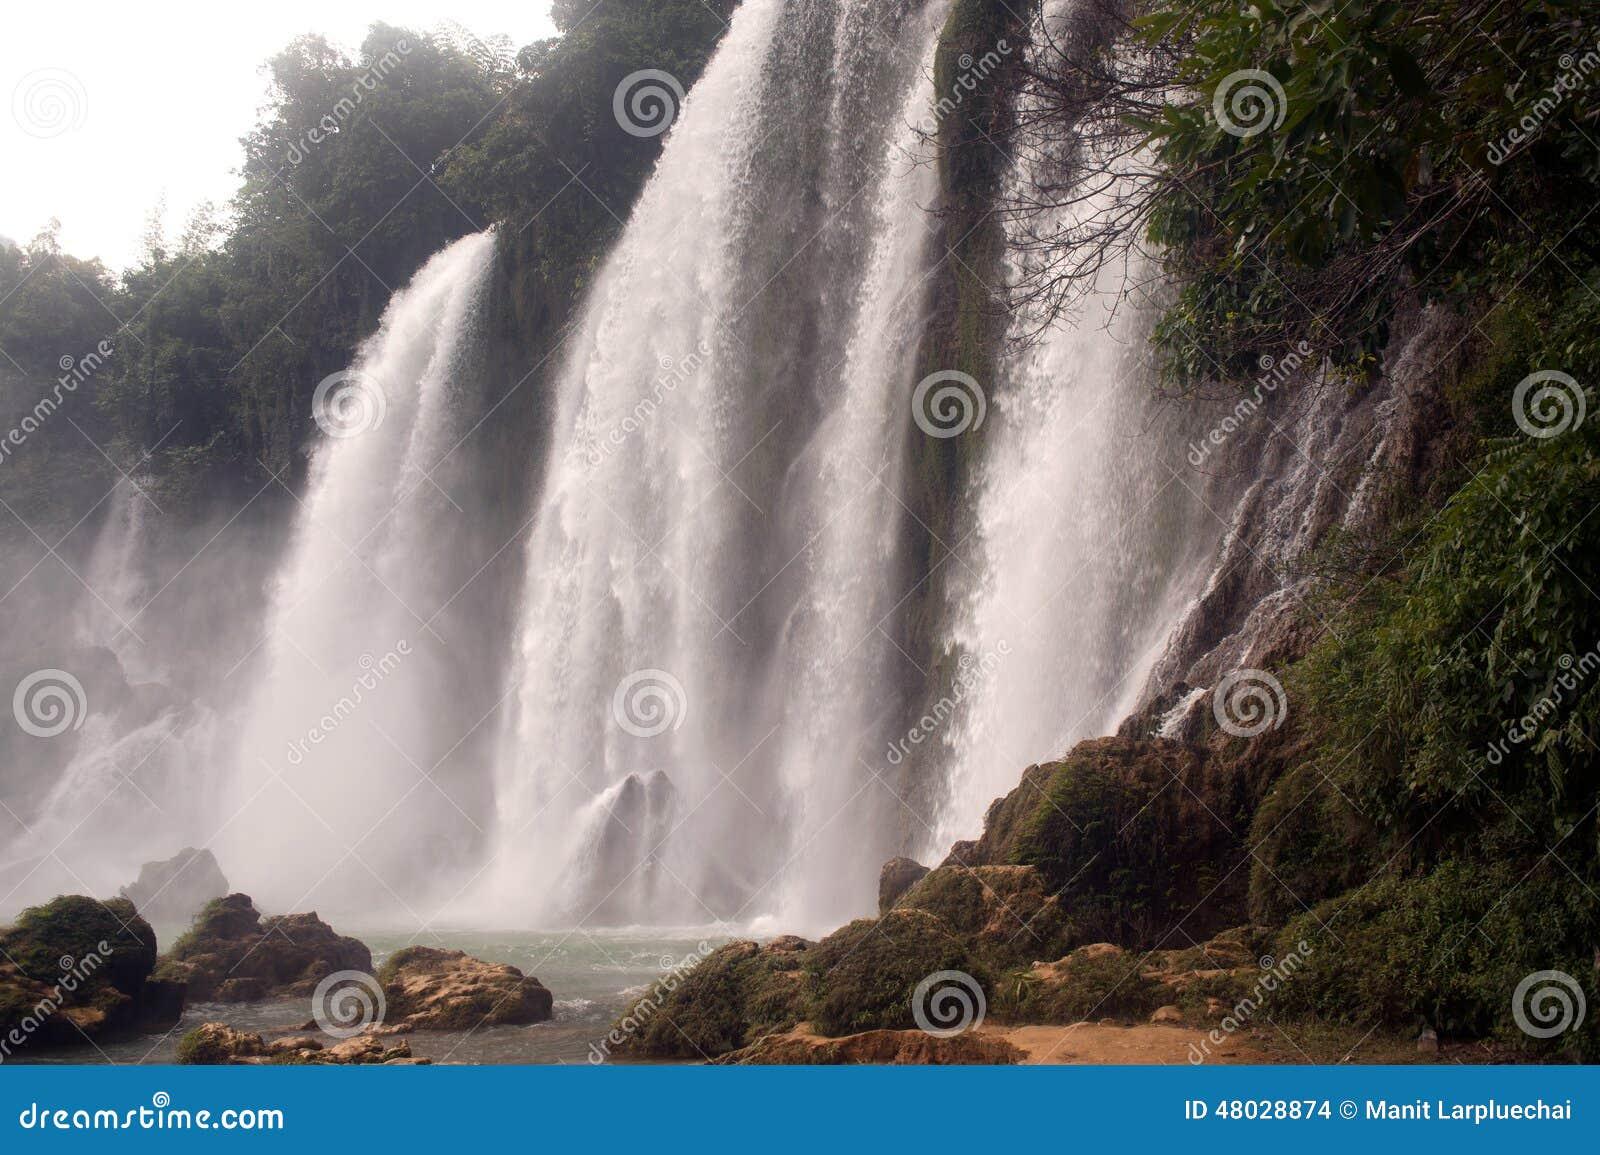 Ban Gioc waterfall in Vietnam.